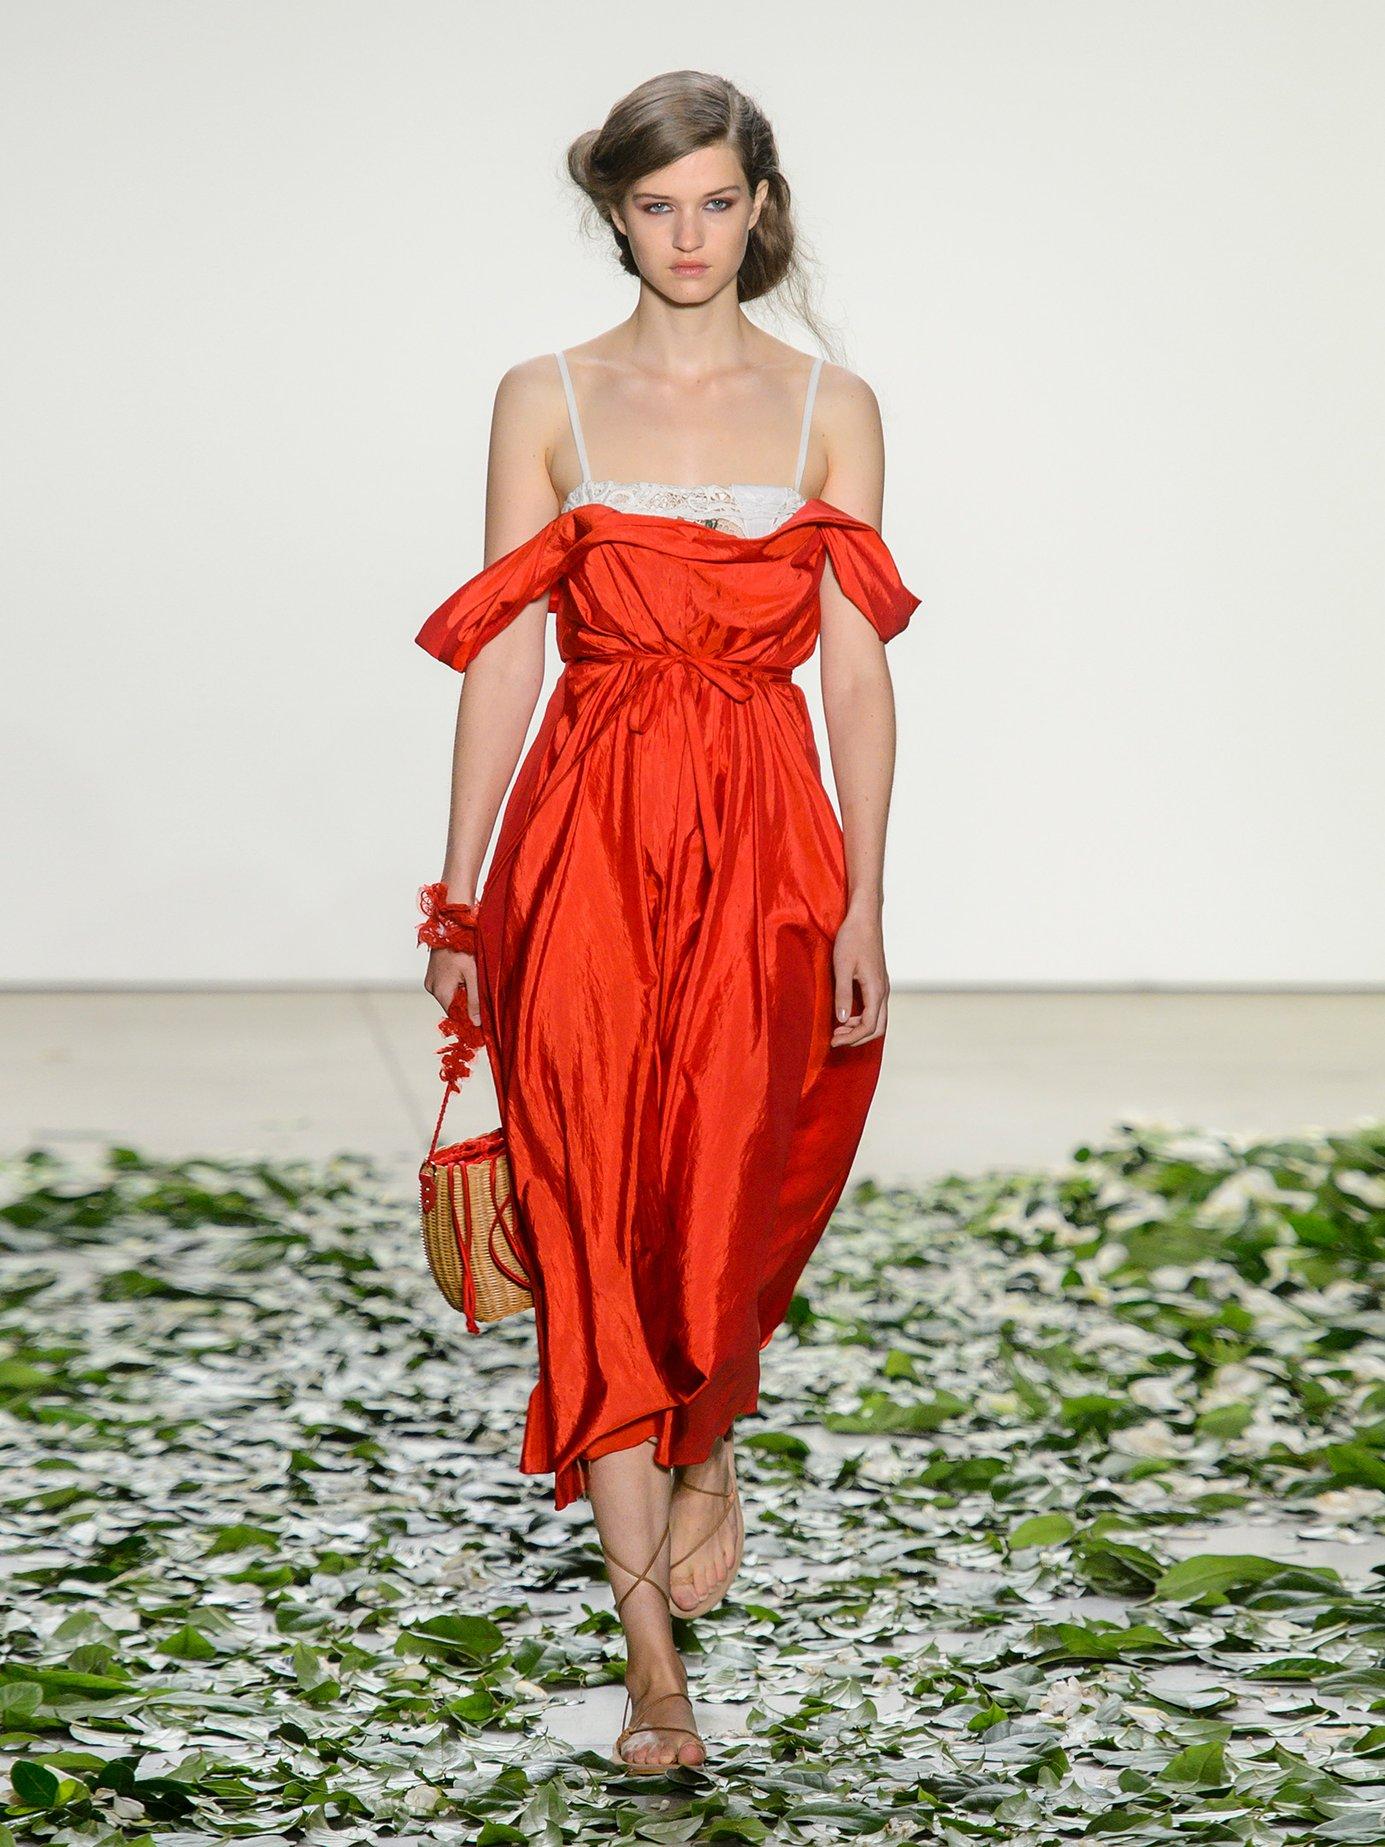 Davi square-neck taffeta dress by Brock Collection